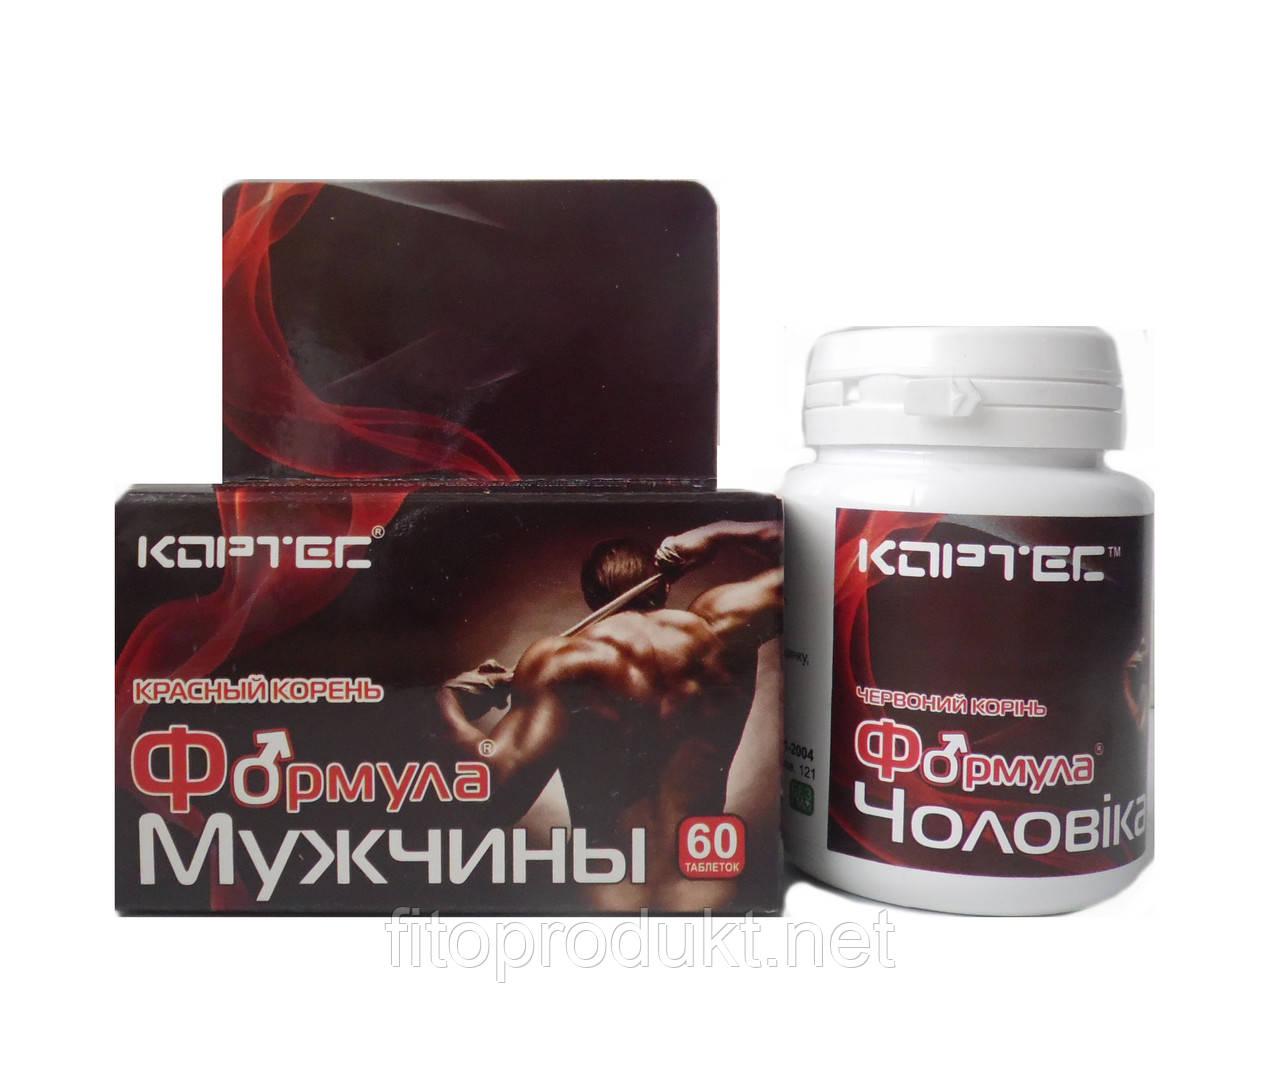 Формула мужчины – стимулятор мужской активности №60 Кортес